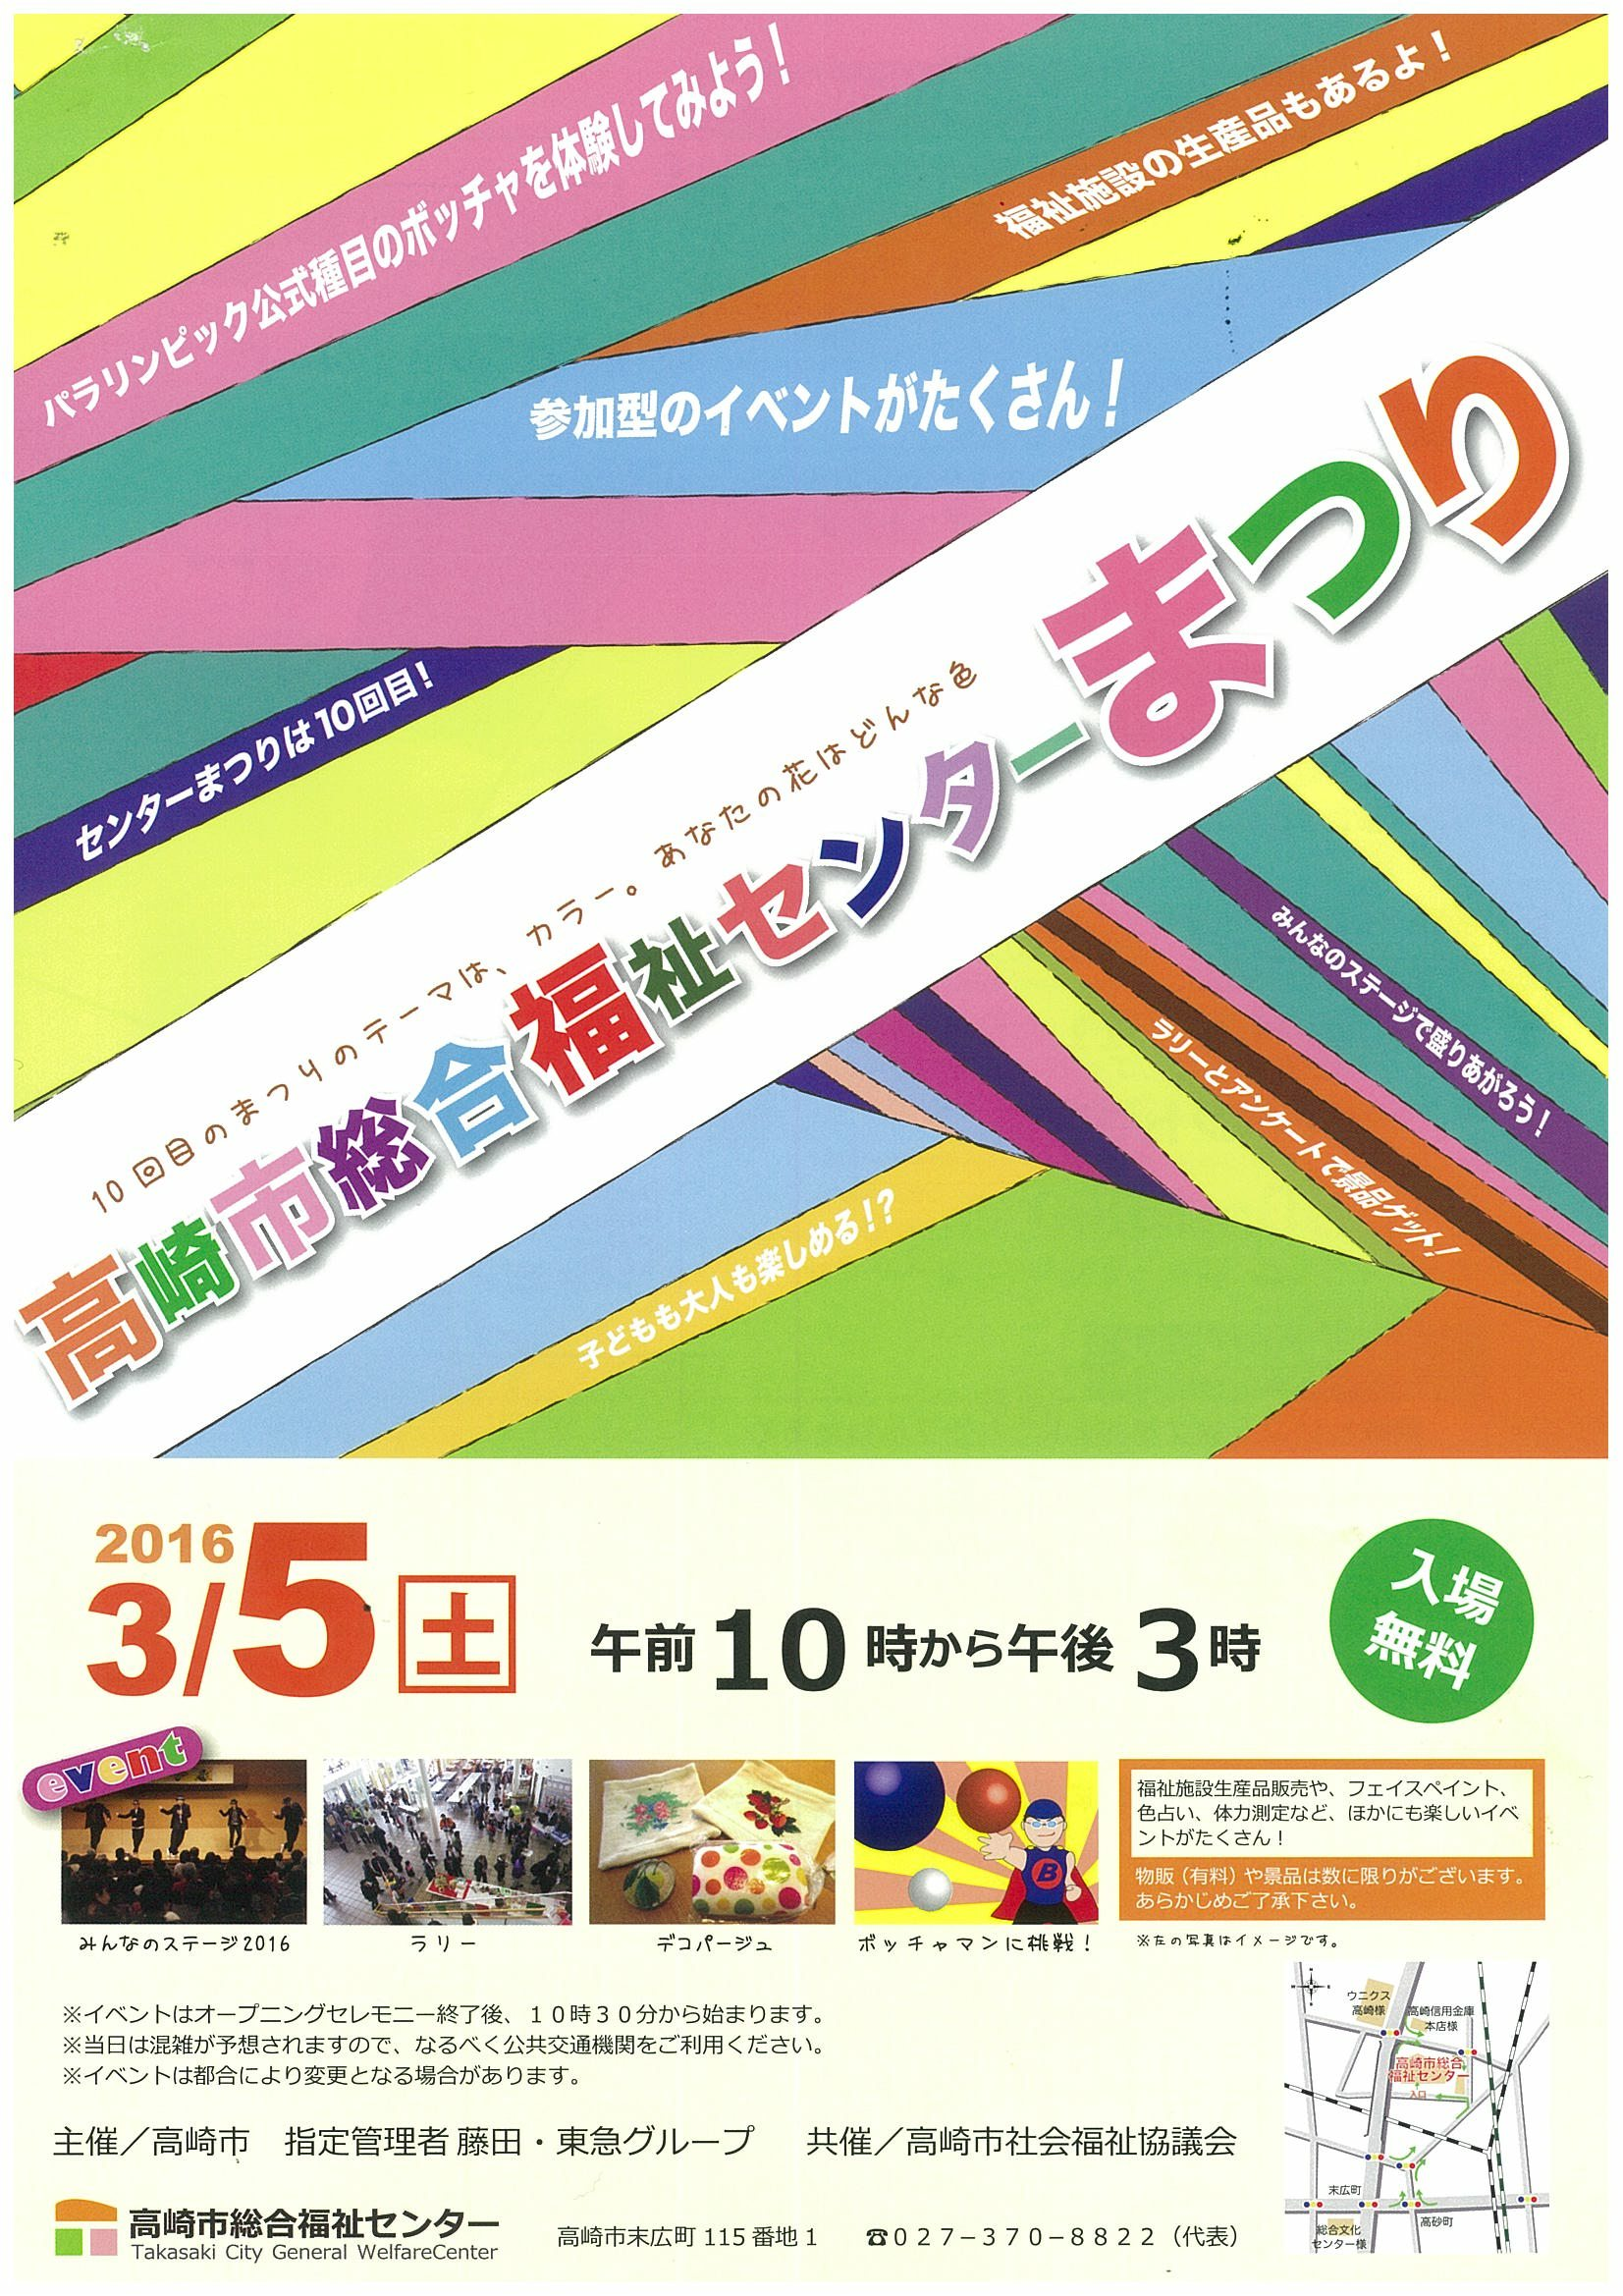 http://takafukushi.ec-net.jp/